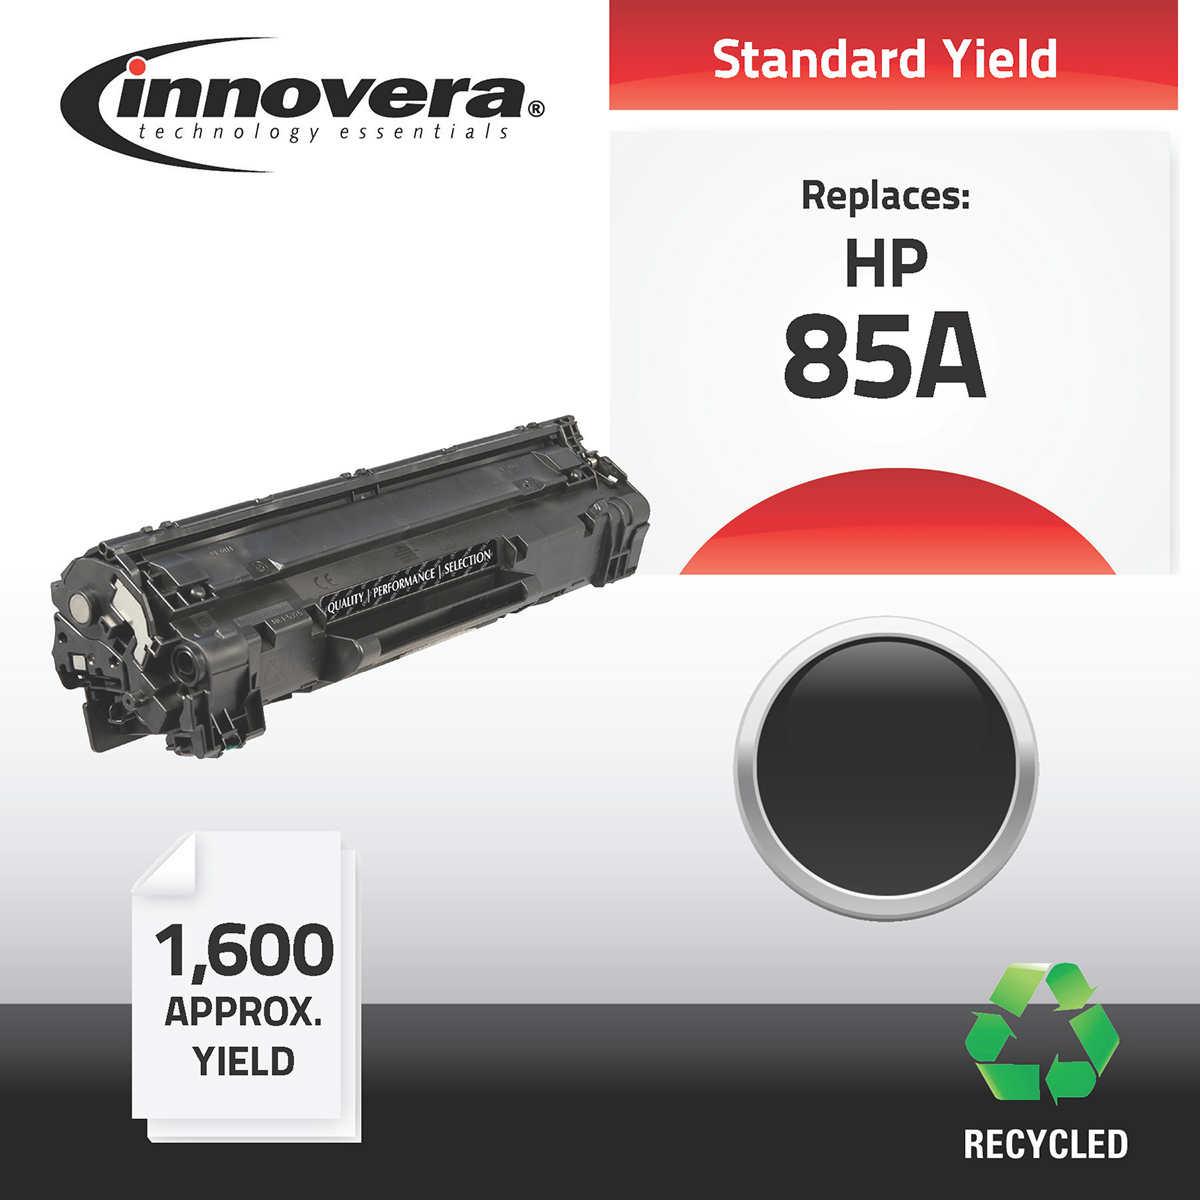 Innovera Remanufactured For Hp 85a Black Toner Cartridge Ebay Catridge Cartridges